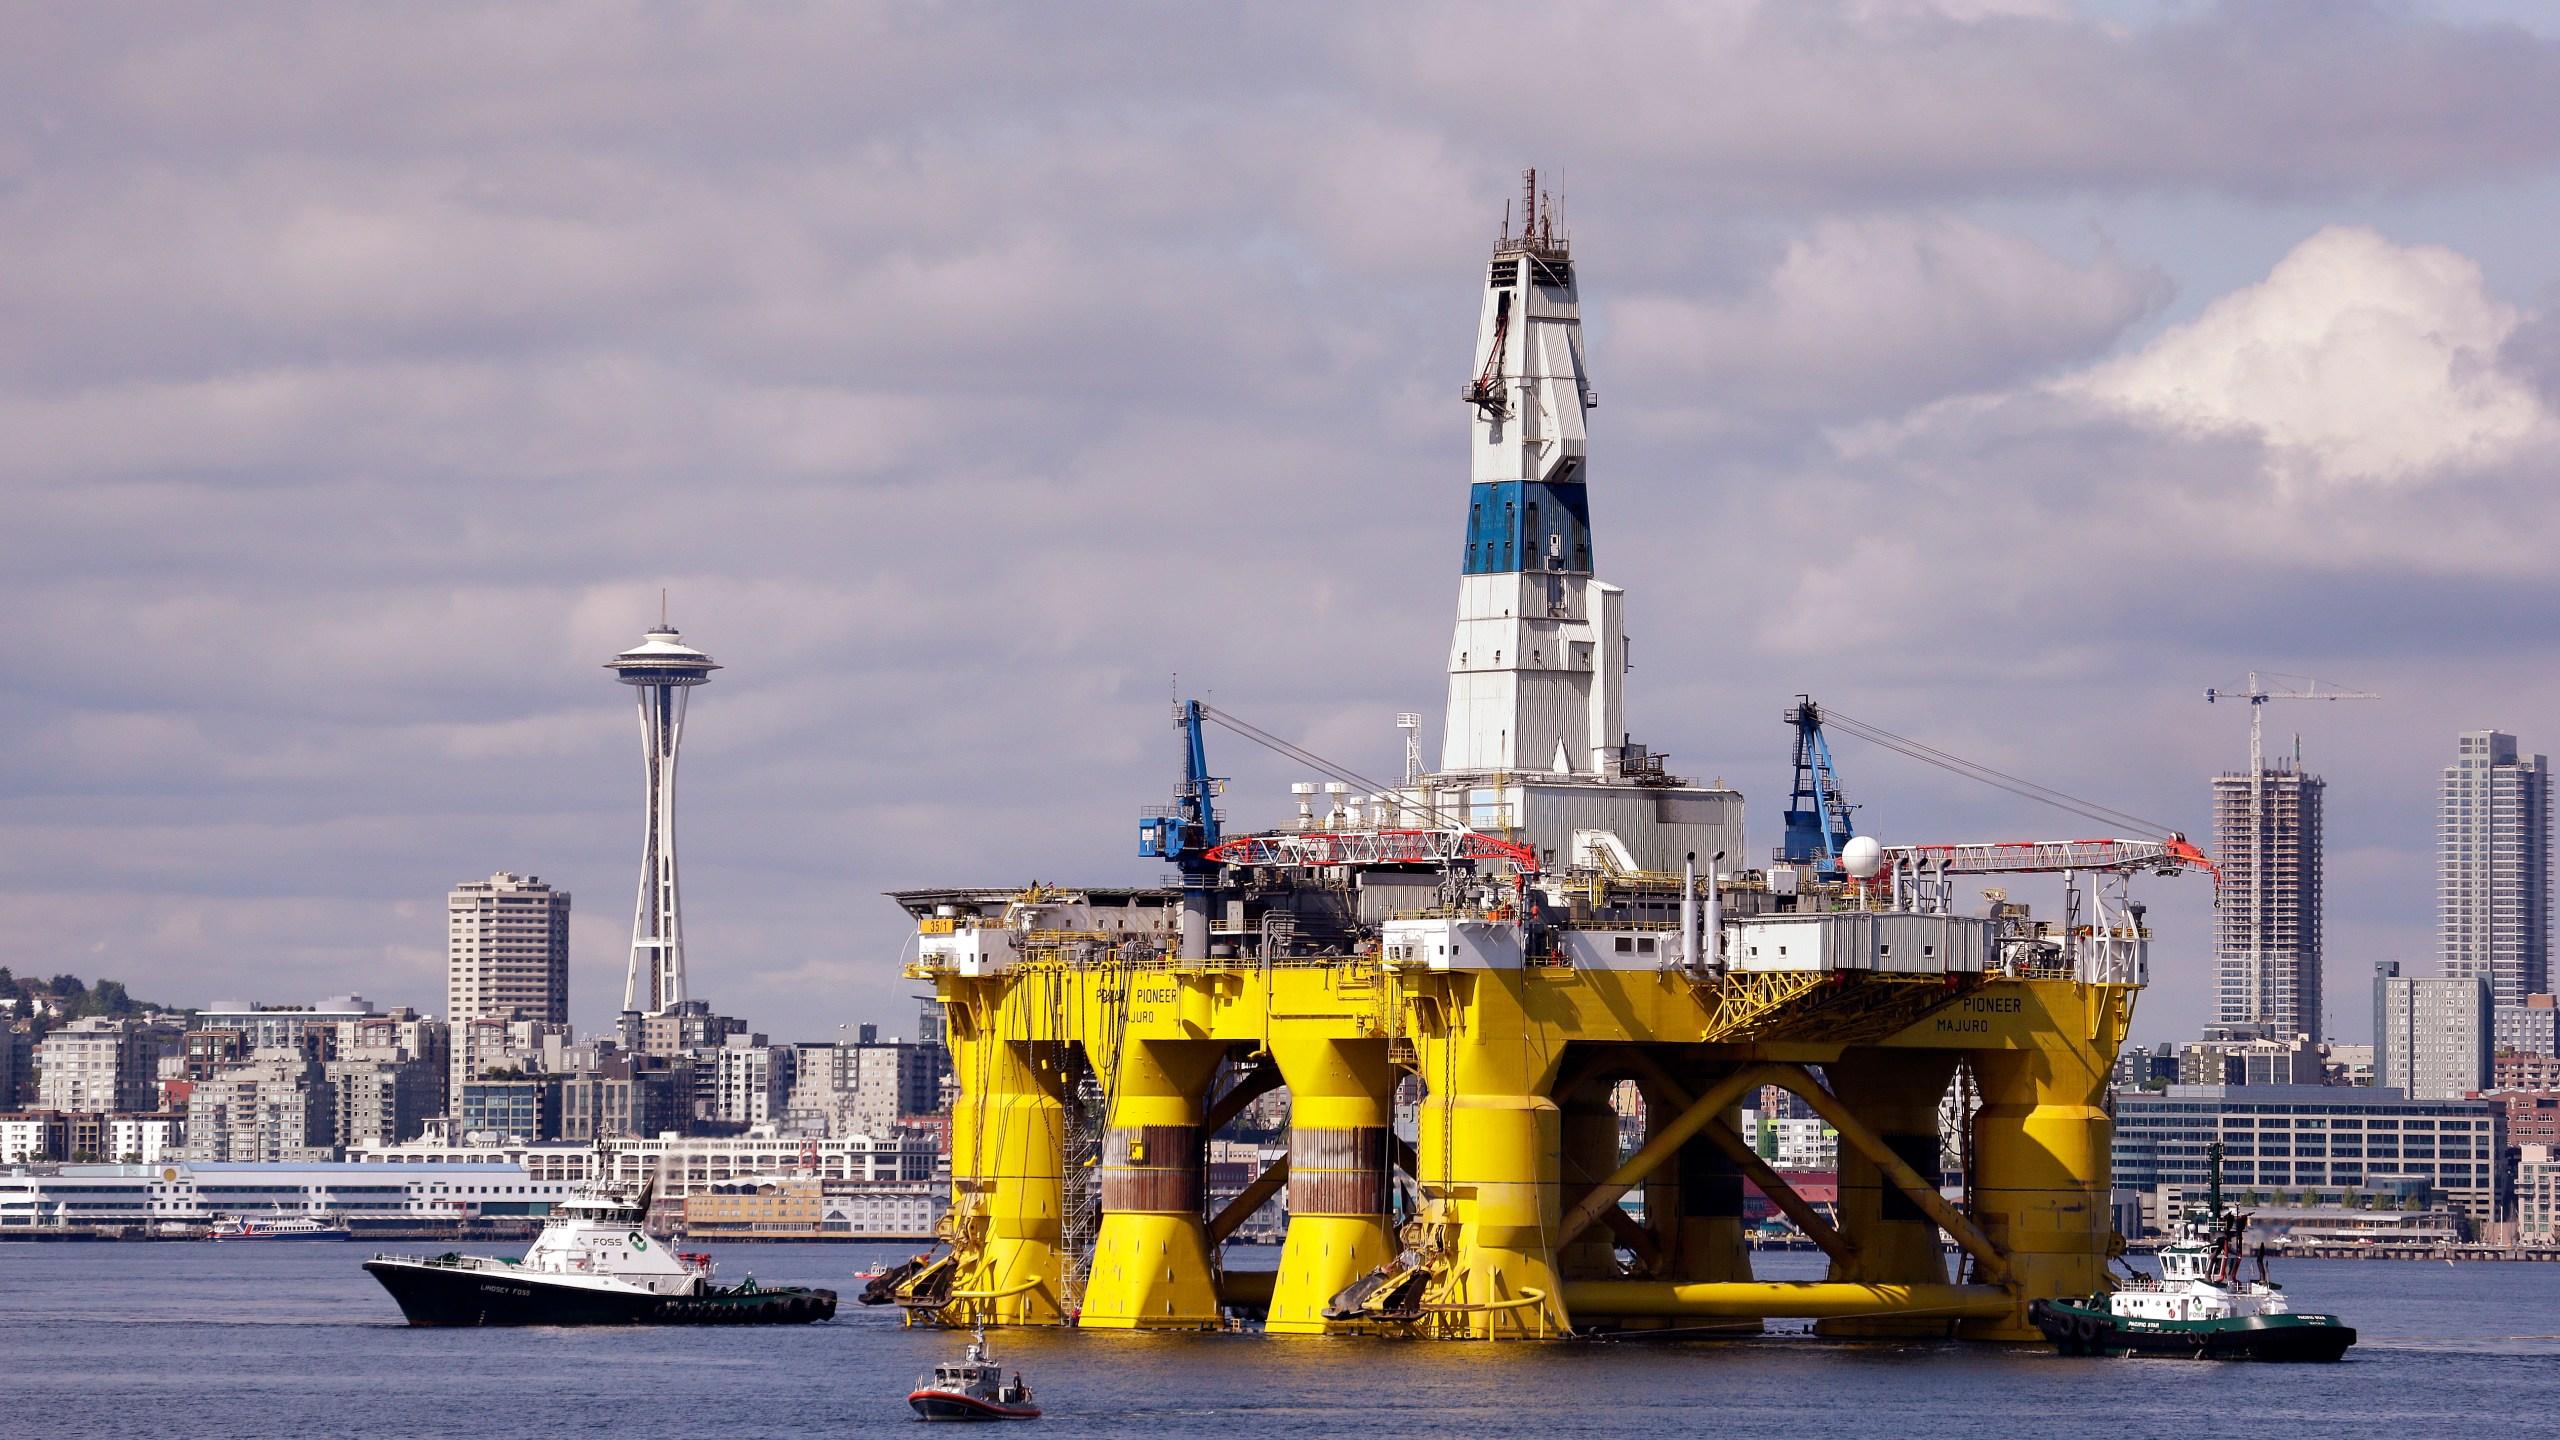 Arctic_Offshore_Drilling_85047-159532.jpg72812635